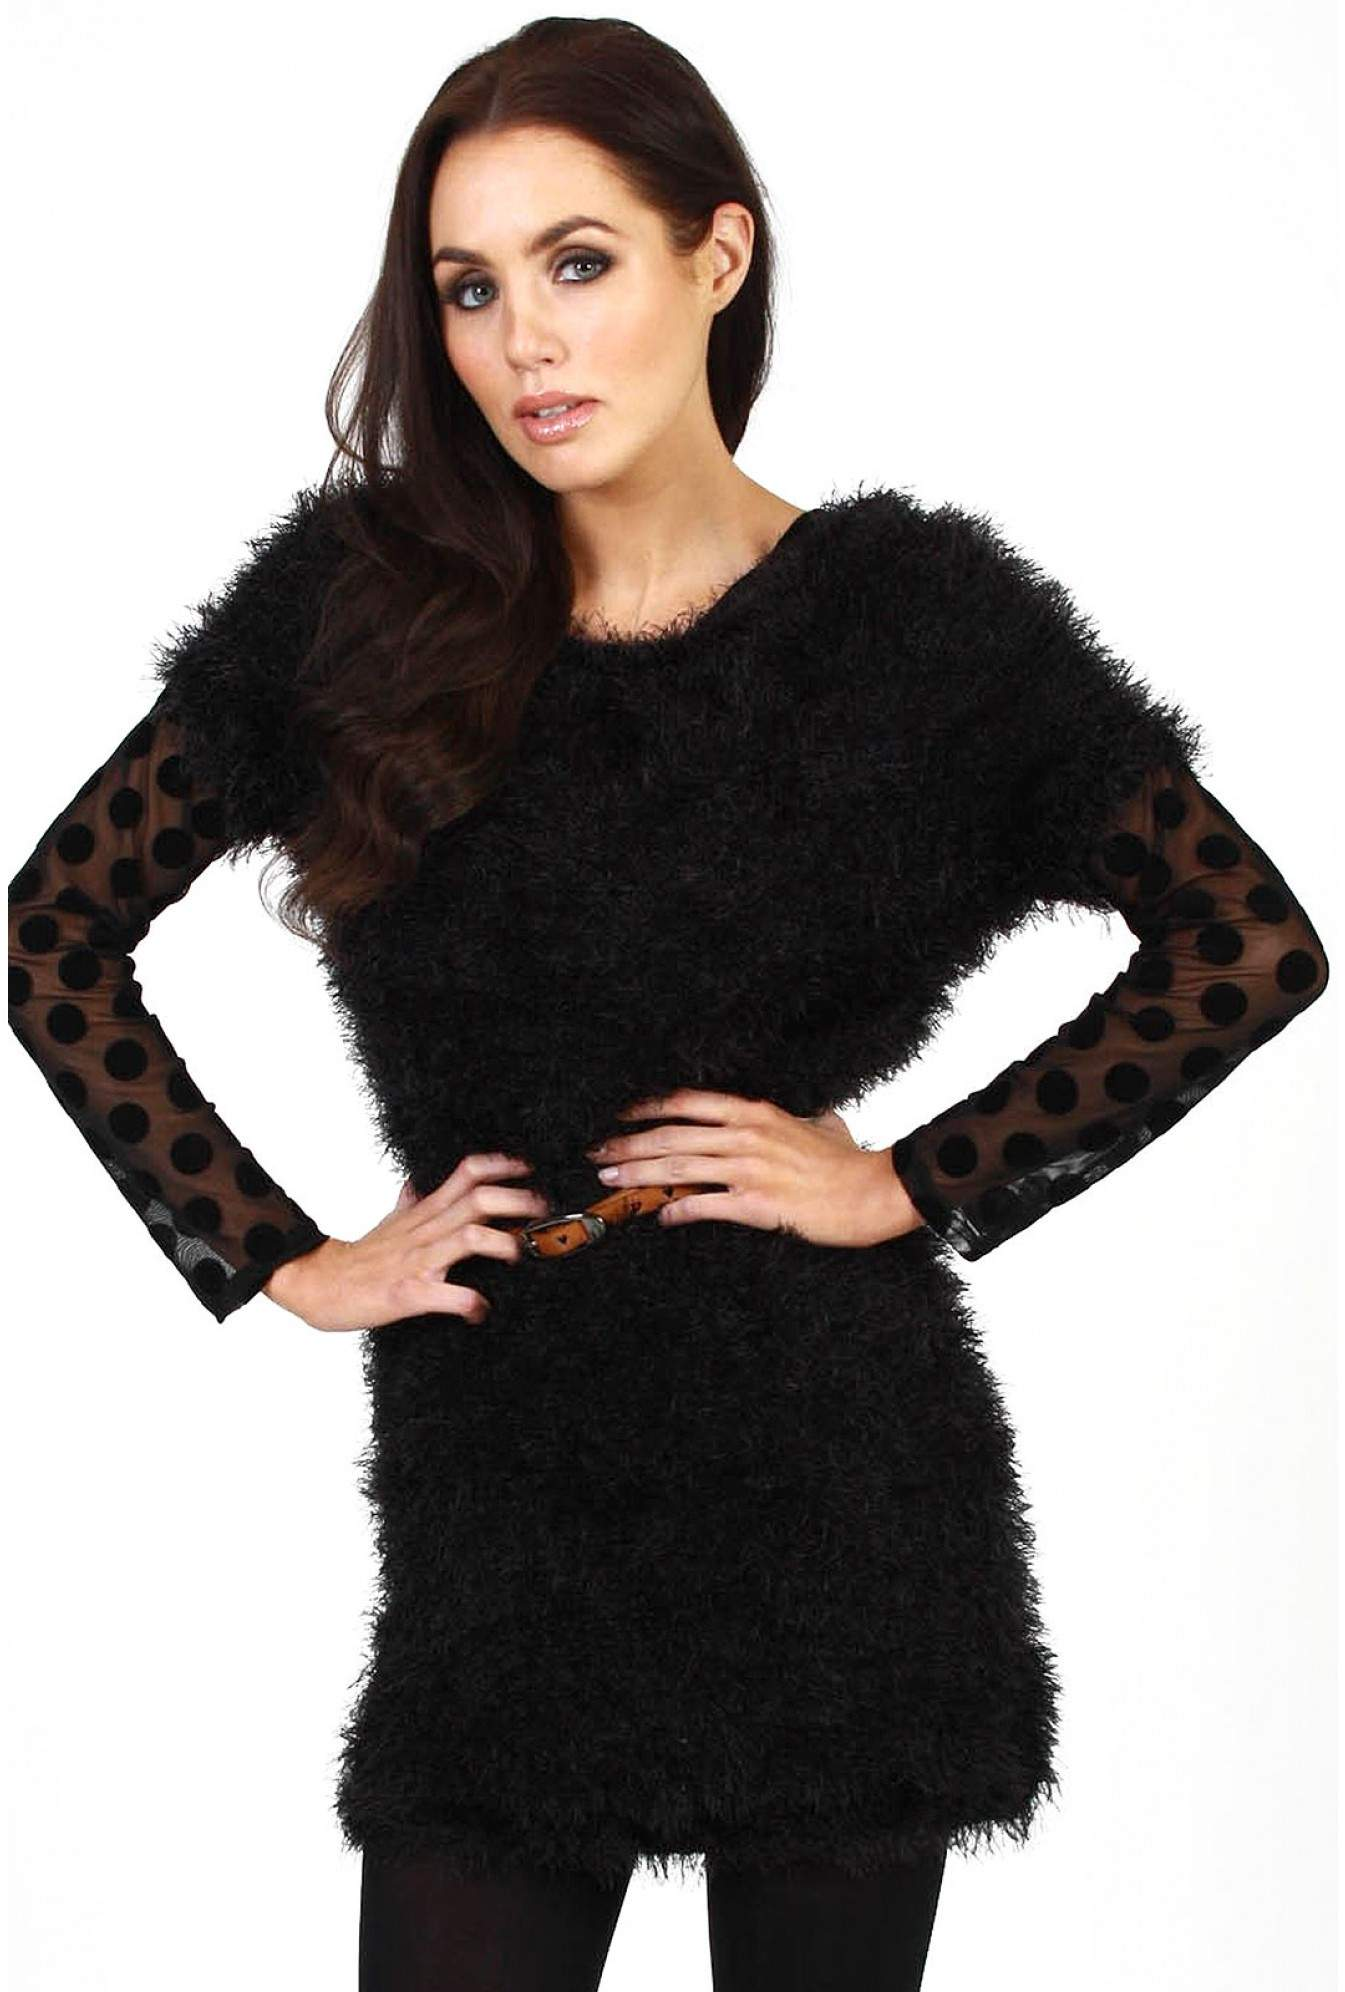 097edd237 More Views. Kerry Faux Fur Tunic Dress